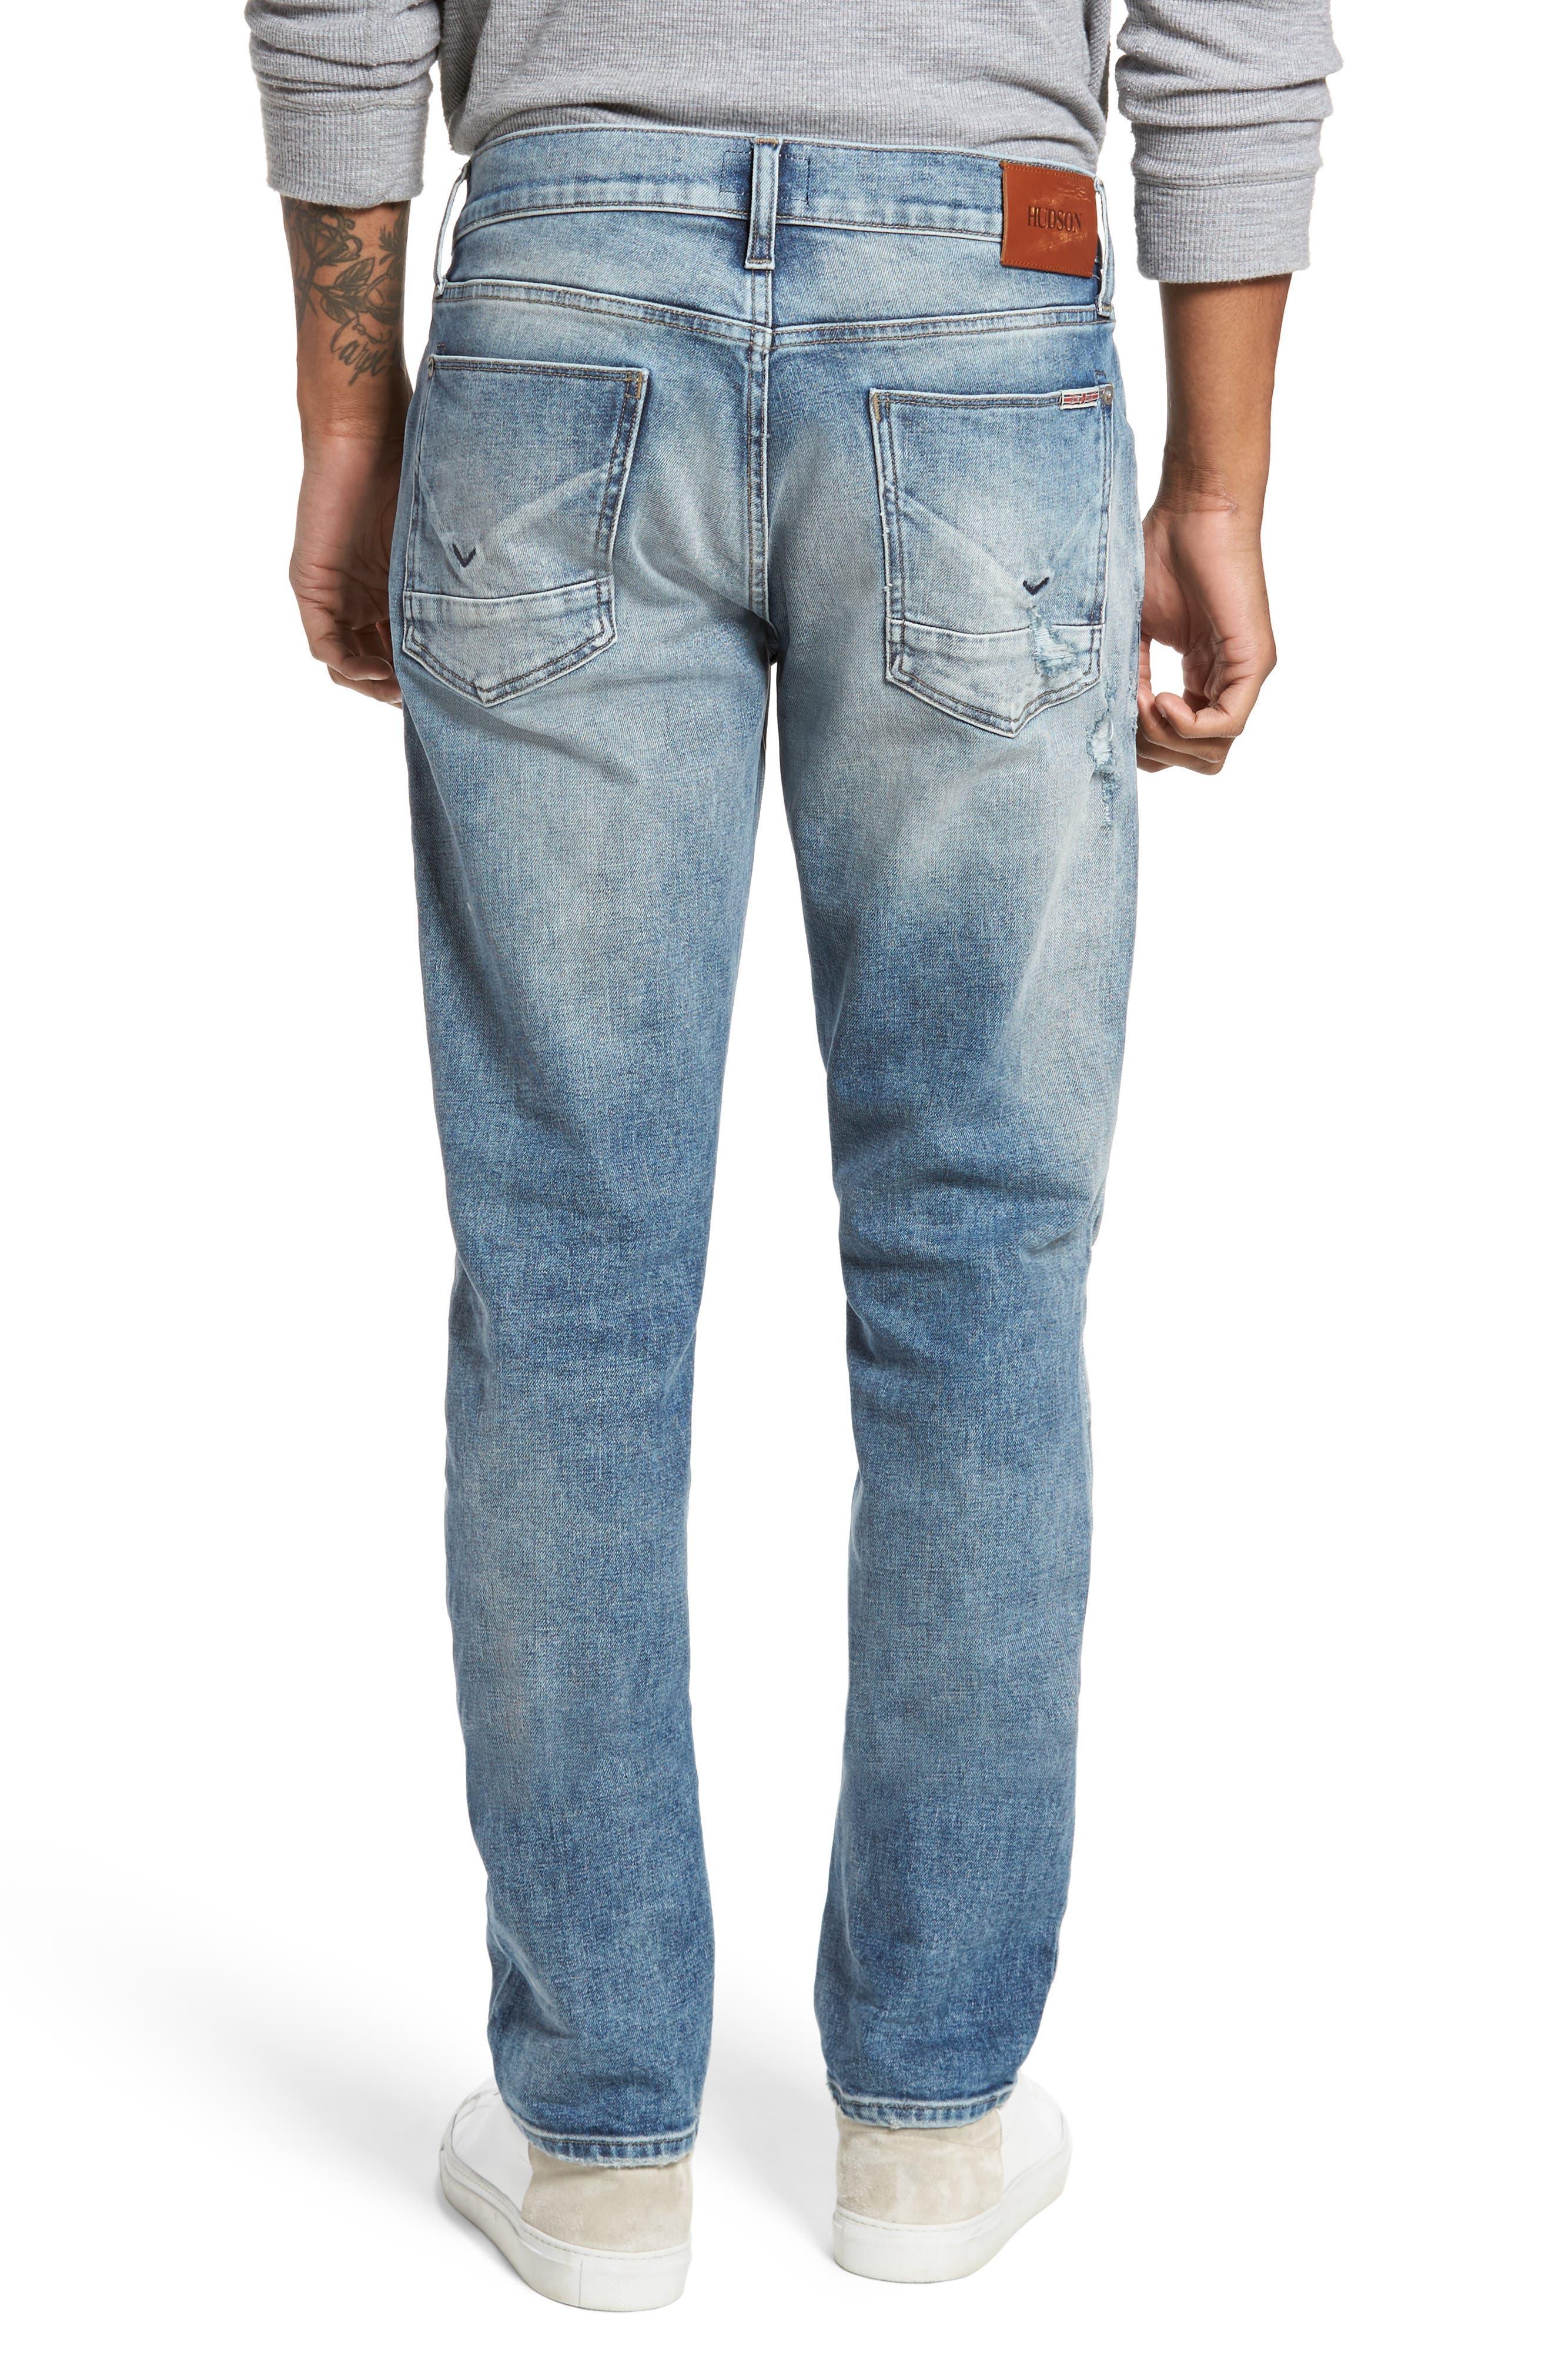 Blake Slim Fit Jeans,                             Alternate thumbnail 2, color,                             Lockwood